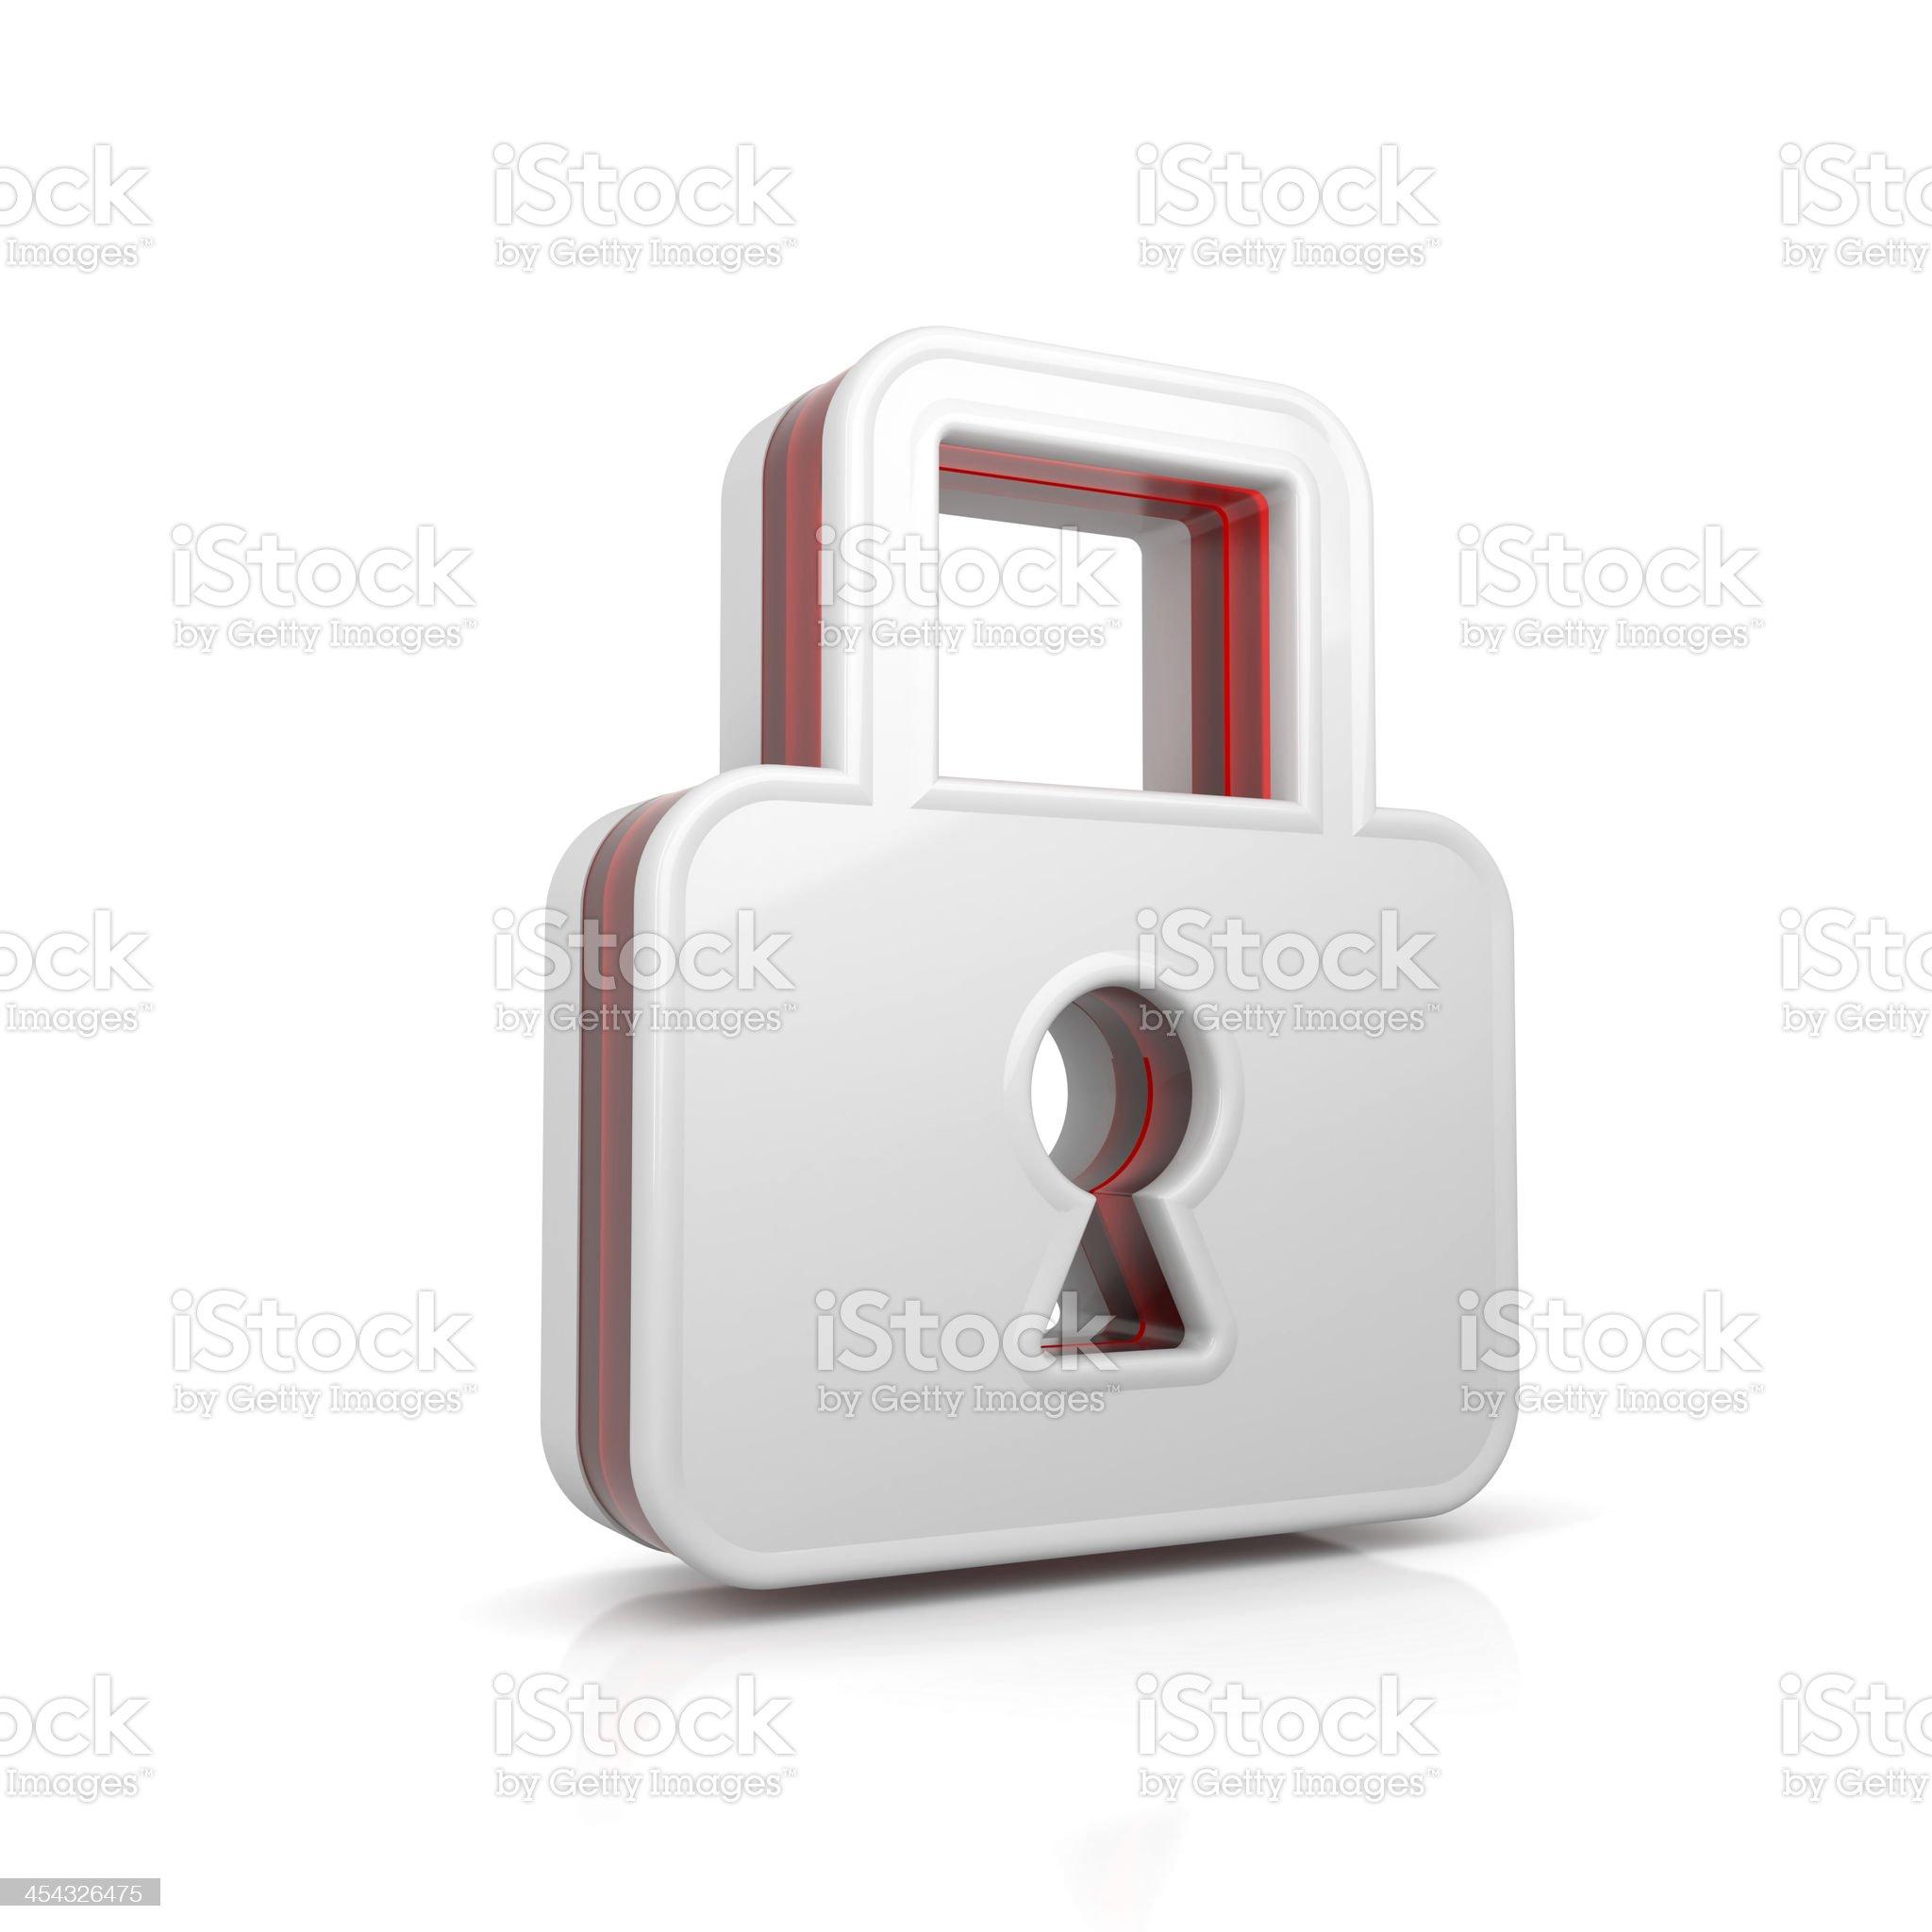 lock symbol royalty-free stock photo